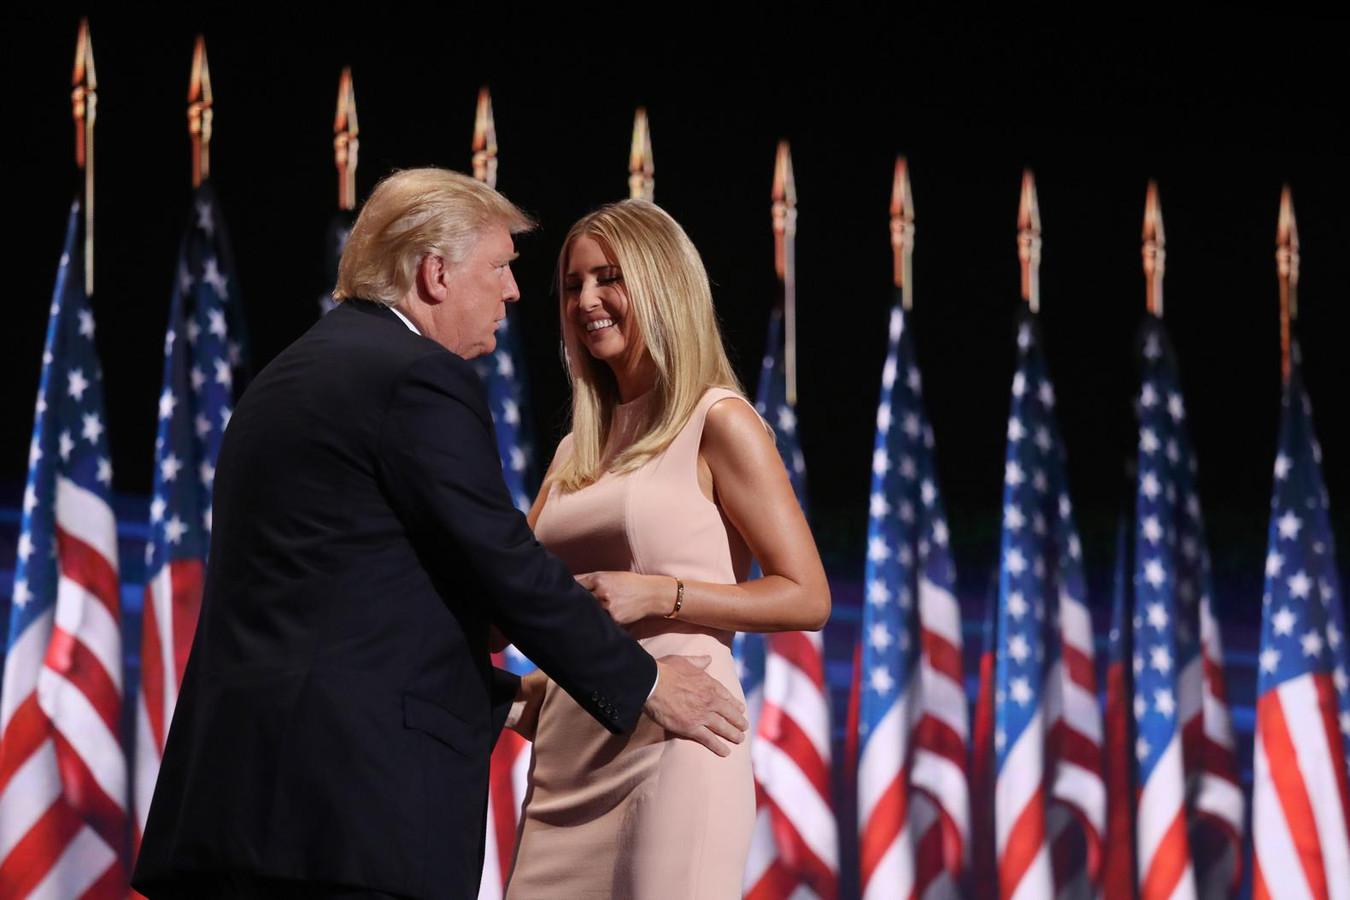 Waarom Ivanka Trump de échte first lady wordt | Foto | AD.nl